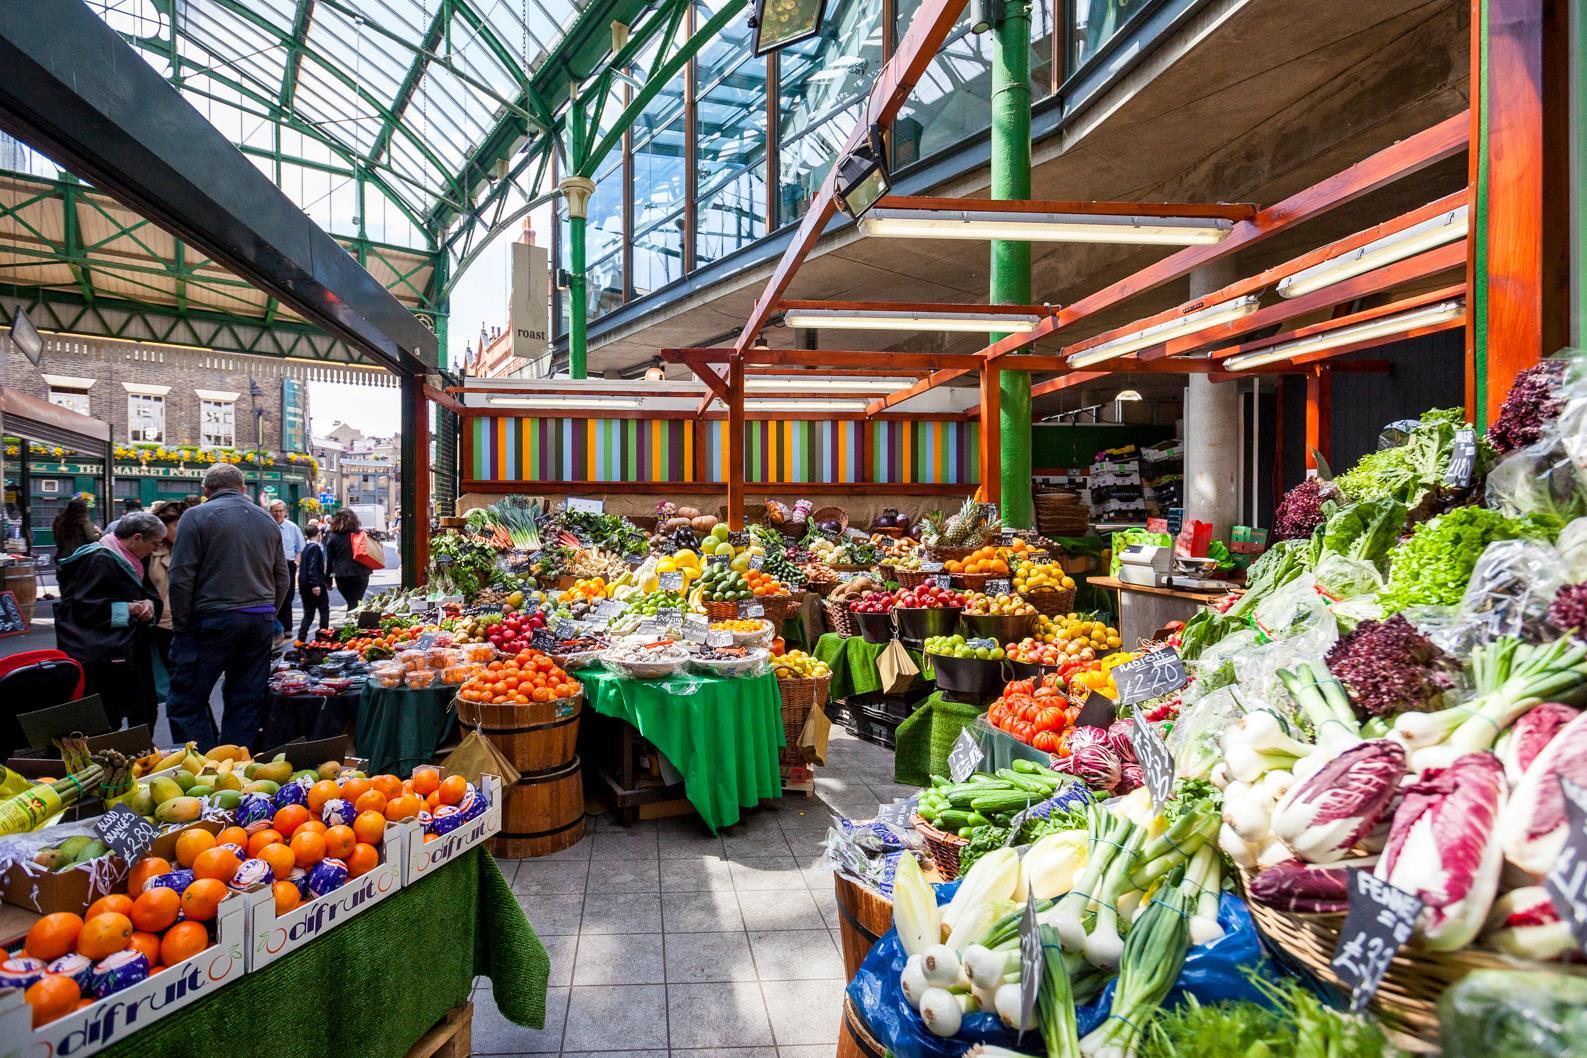 Photo Credit: Borough Market